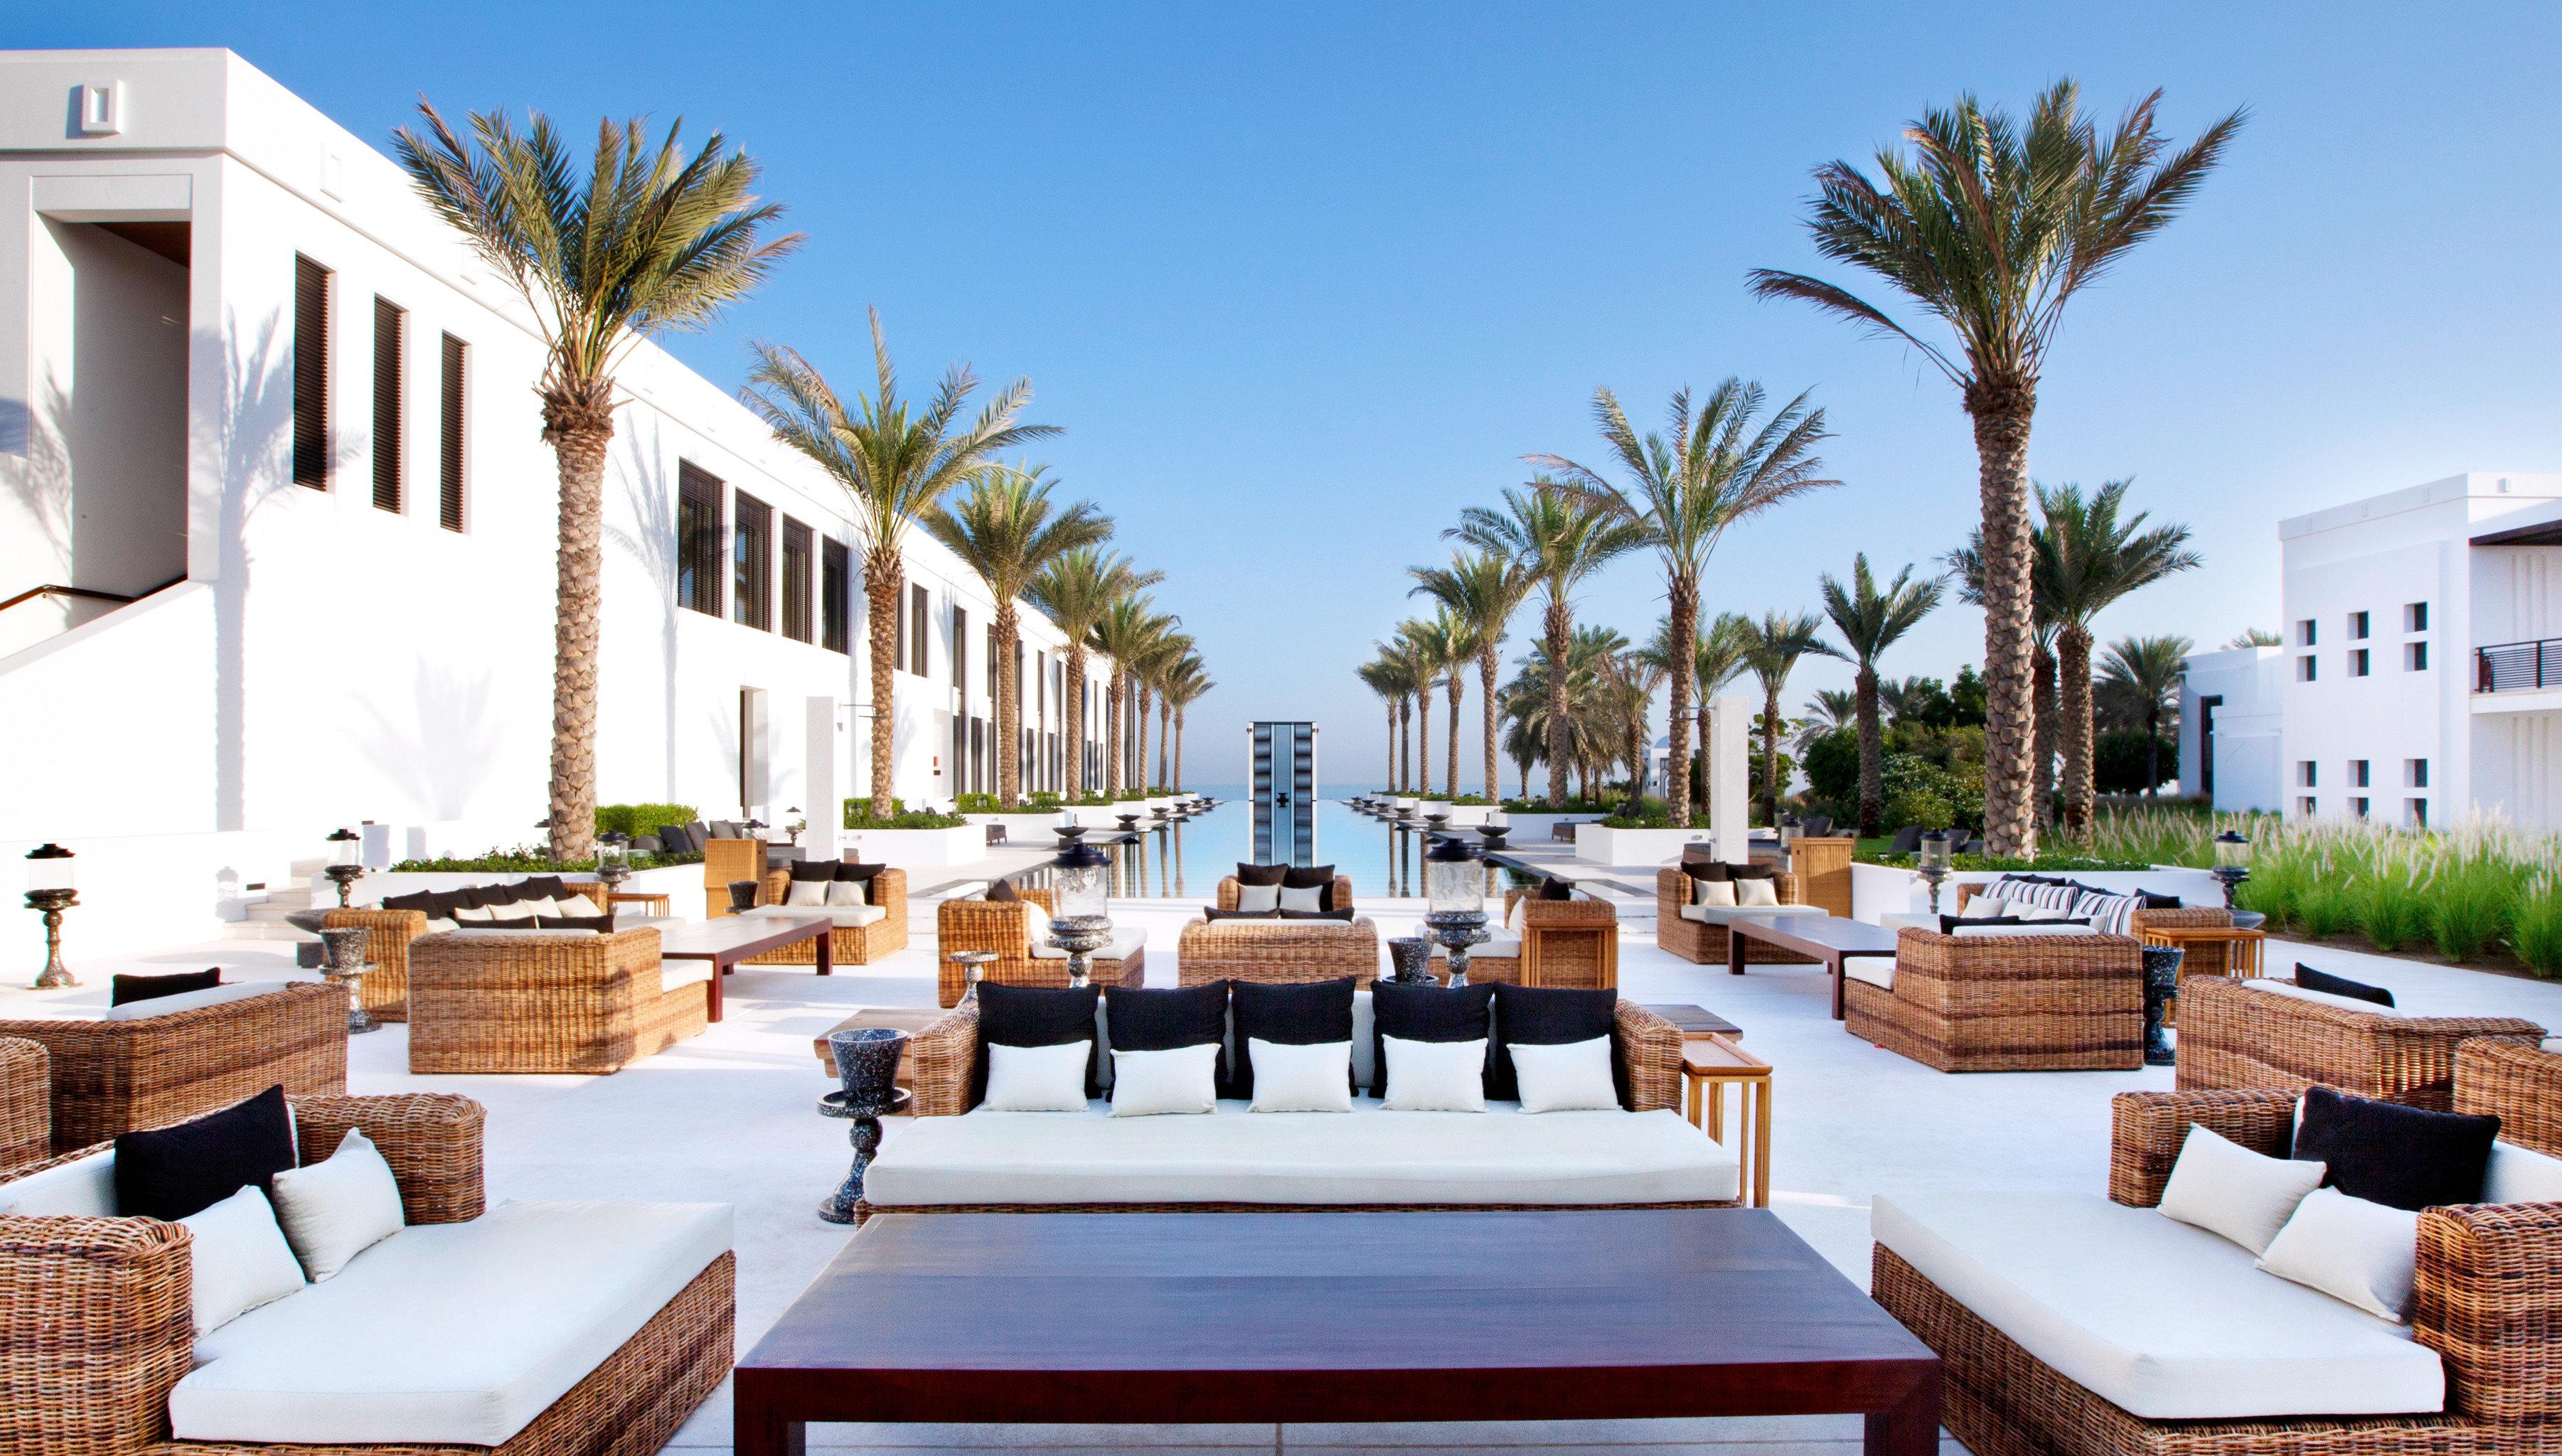 Classic Lounge Patio Resort Scenic views property building condominium Villa restaurant hacienda plaza Courtyard palace